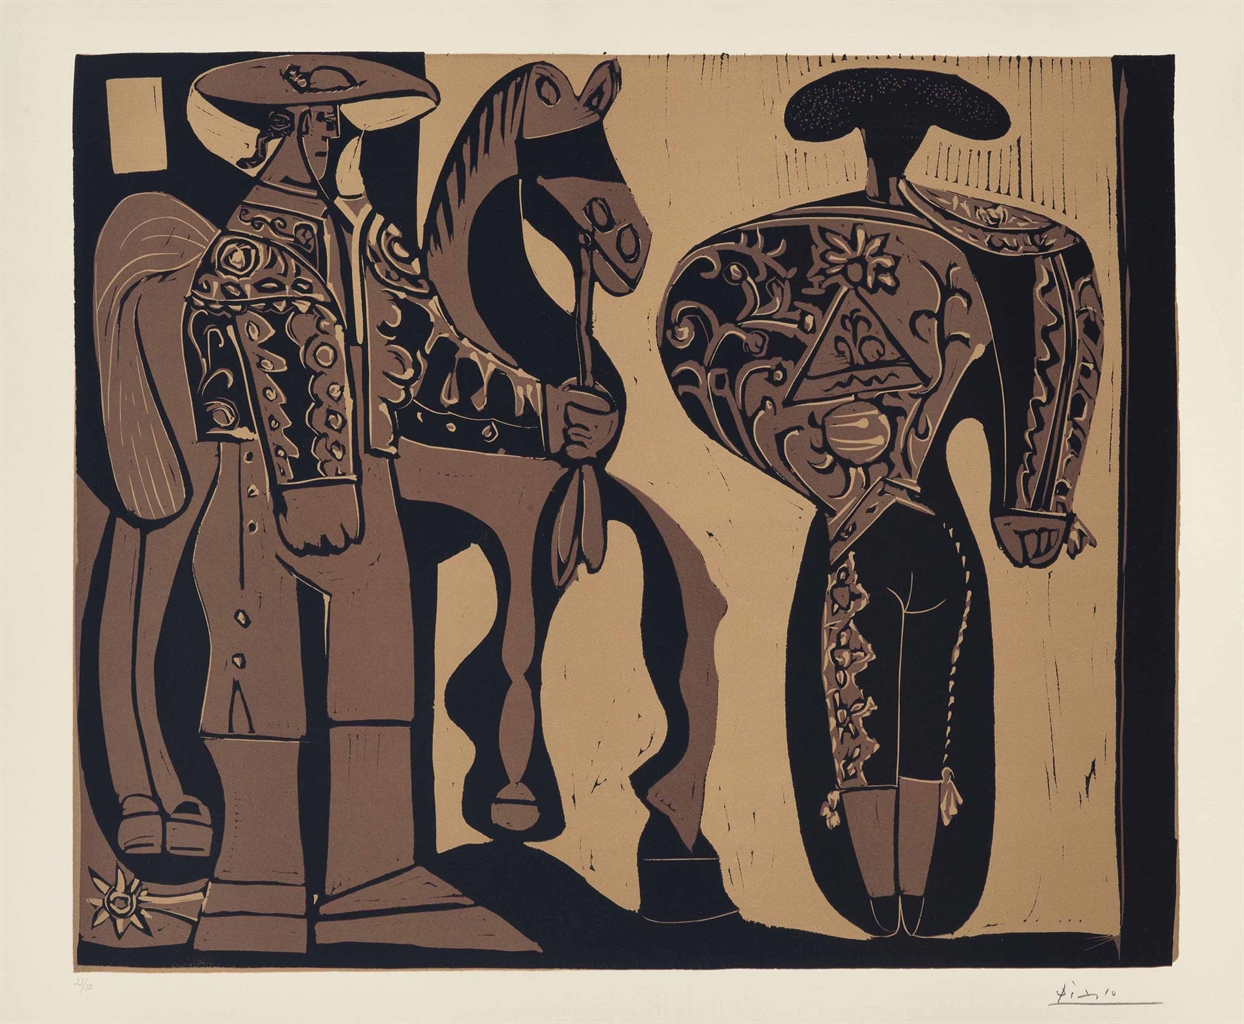 Pablo Picasso-Picador et Torero Attendant le Paseo de Cuadrillas-1959